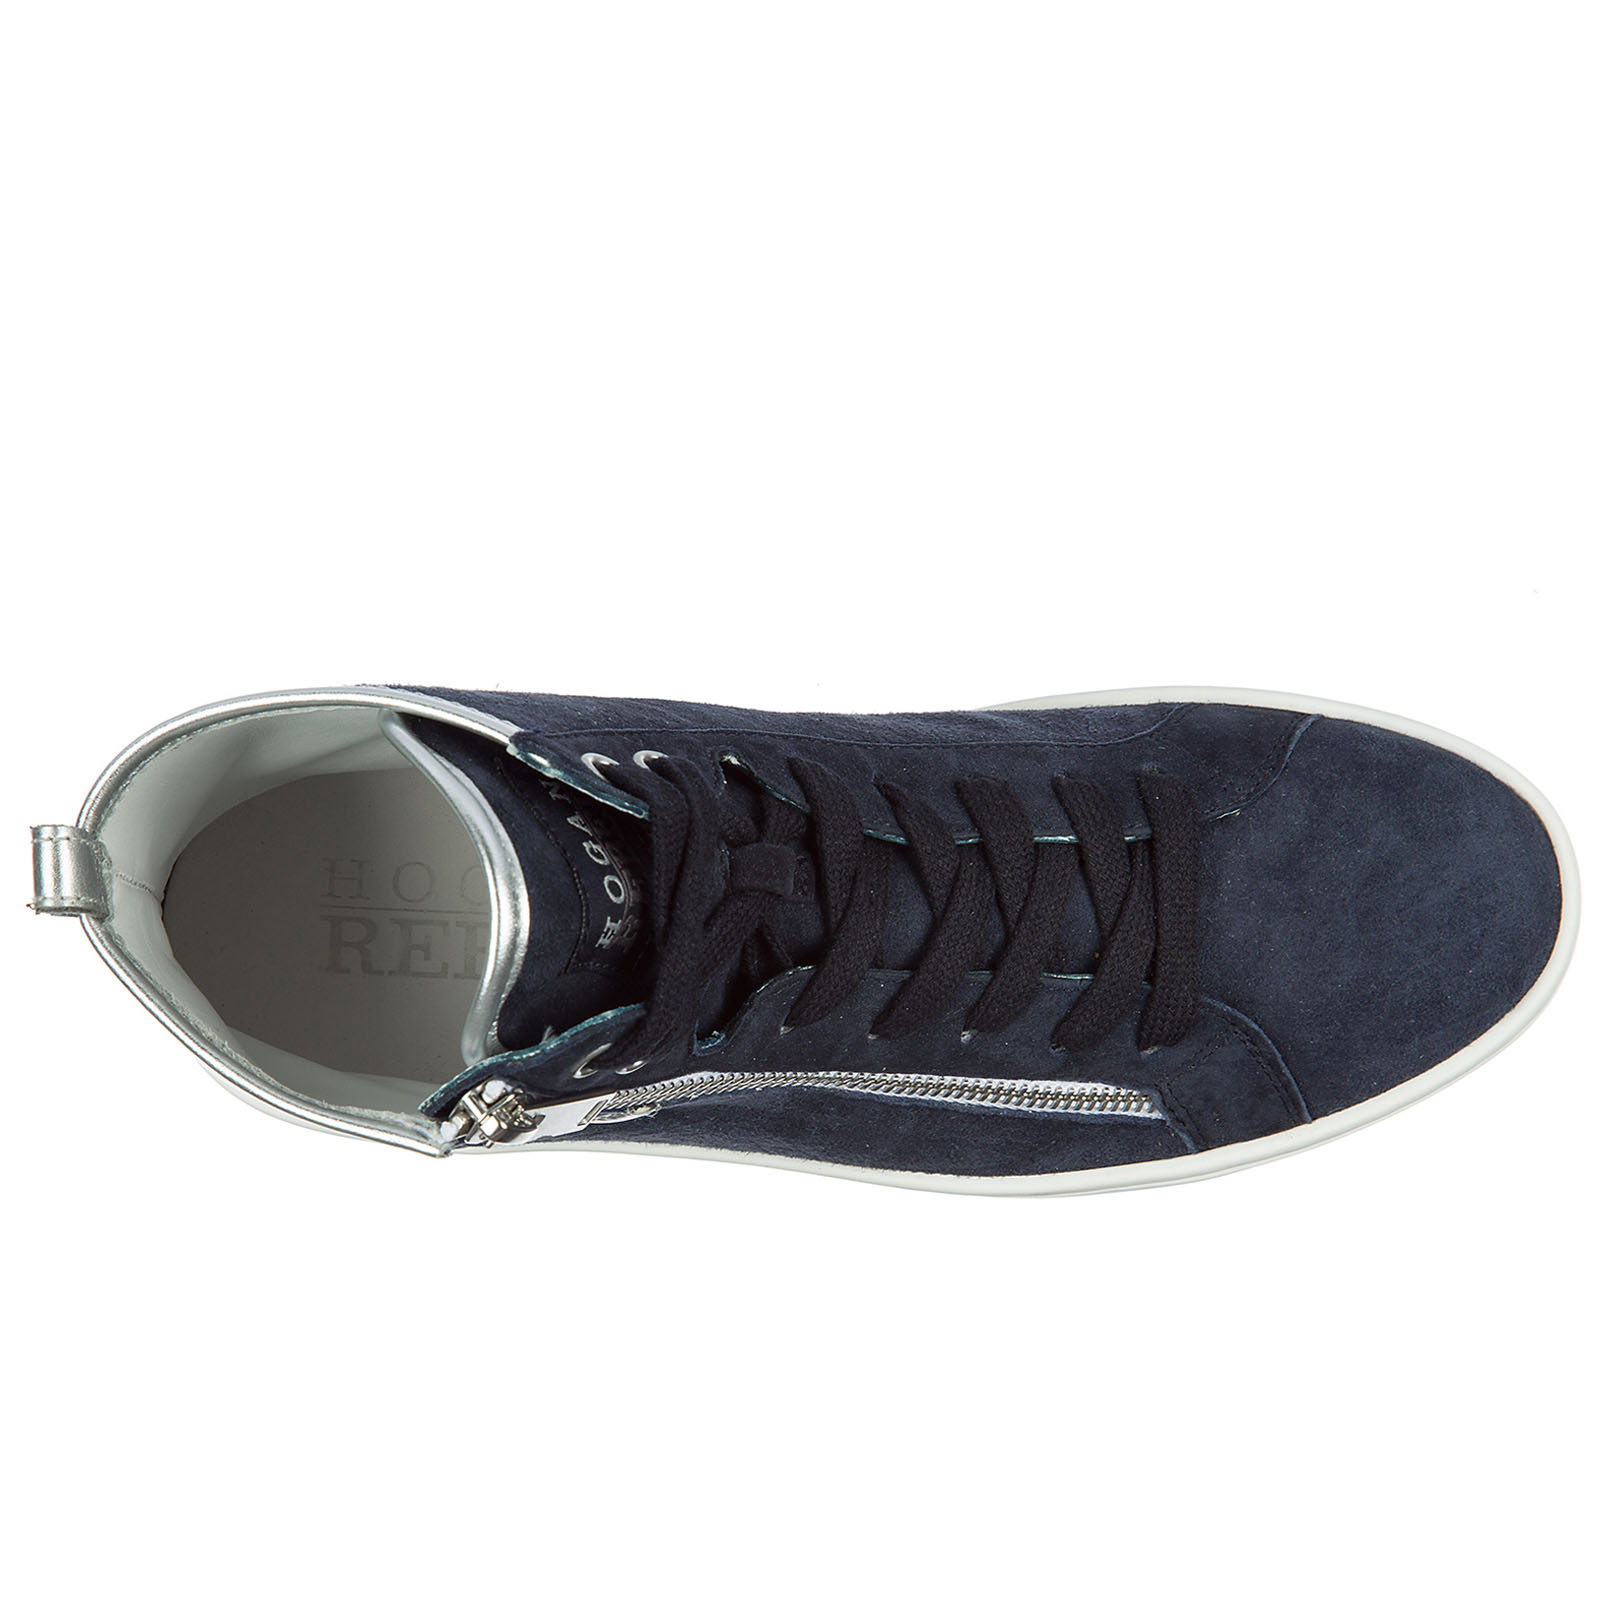 Sneakers alte Hogan Rebel R182 HXW1820Q980VR2123F argento blu denim ... b83f9765715